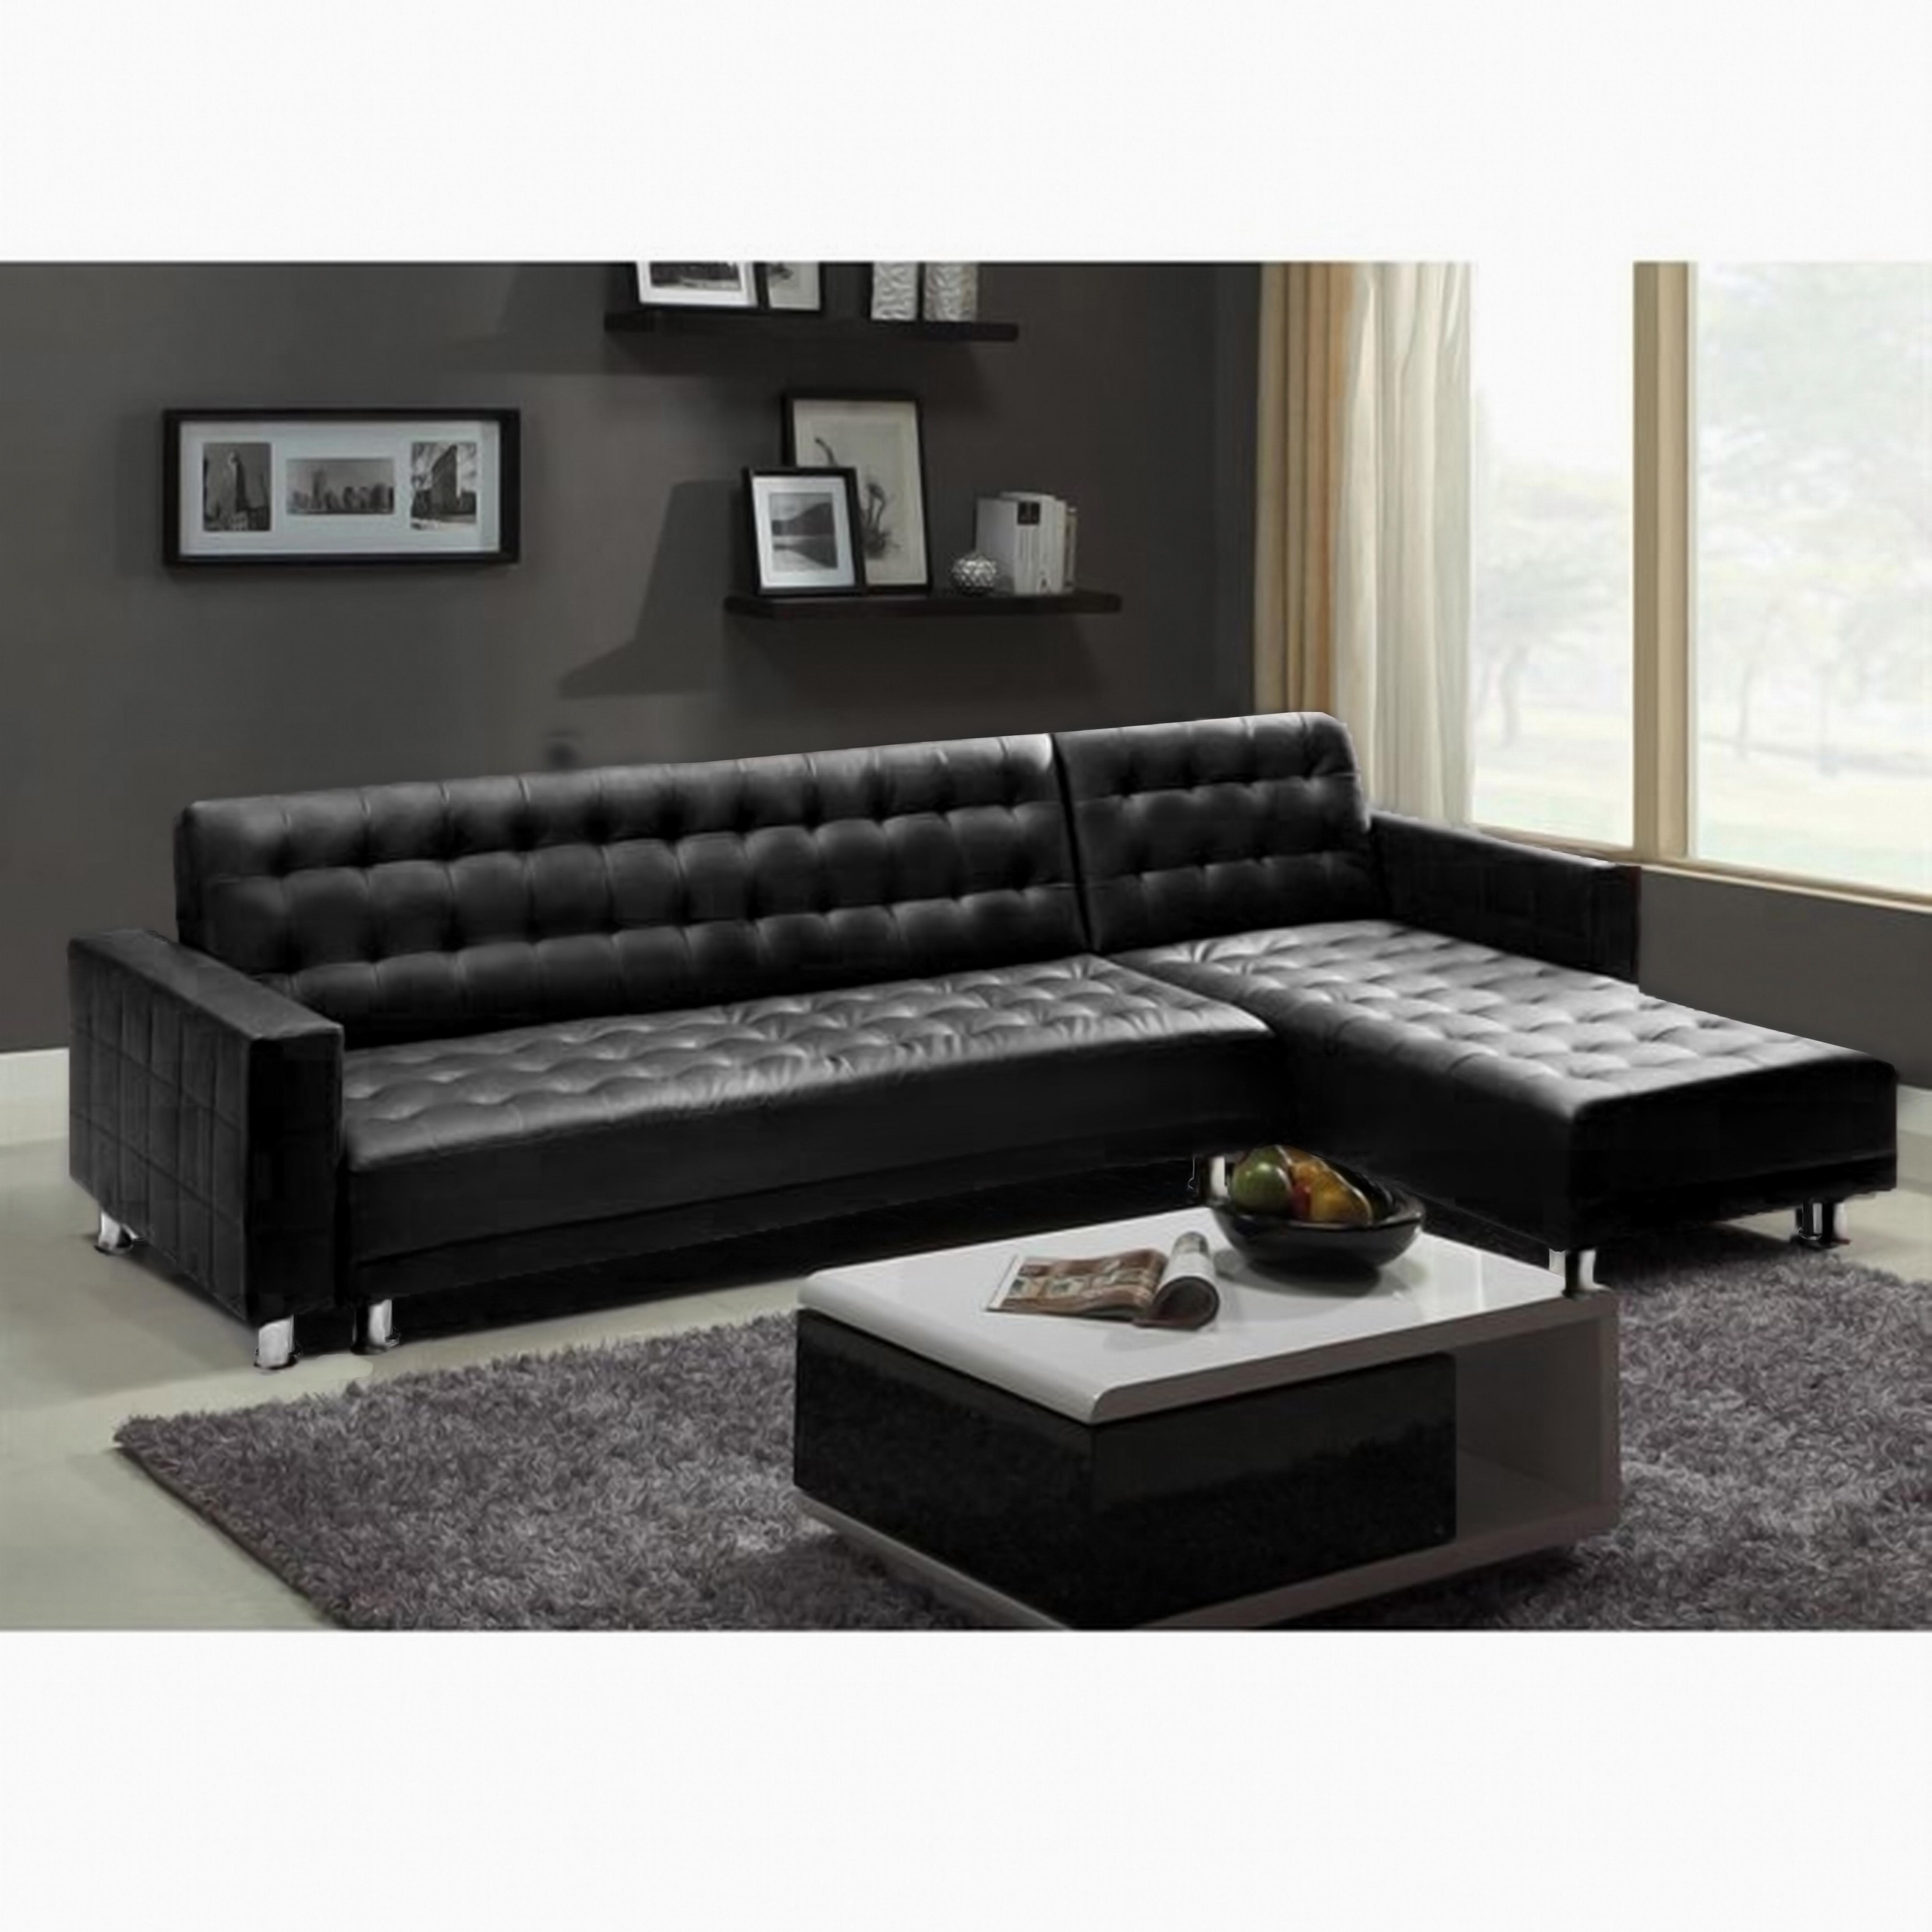 photos canap d 39 angle convertible cuir noir pas cher. Black Bedroom Furniture Sets. Home Design Ideas